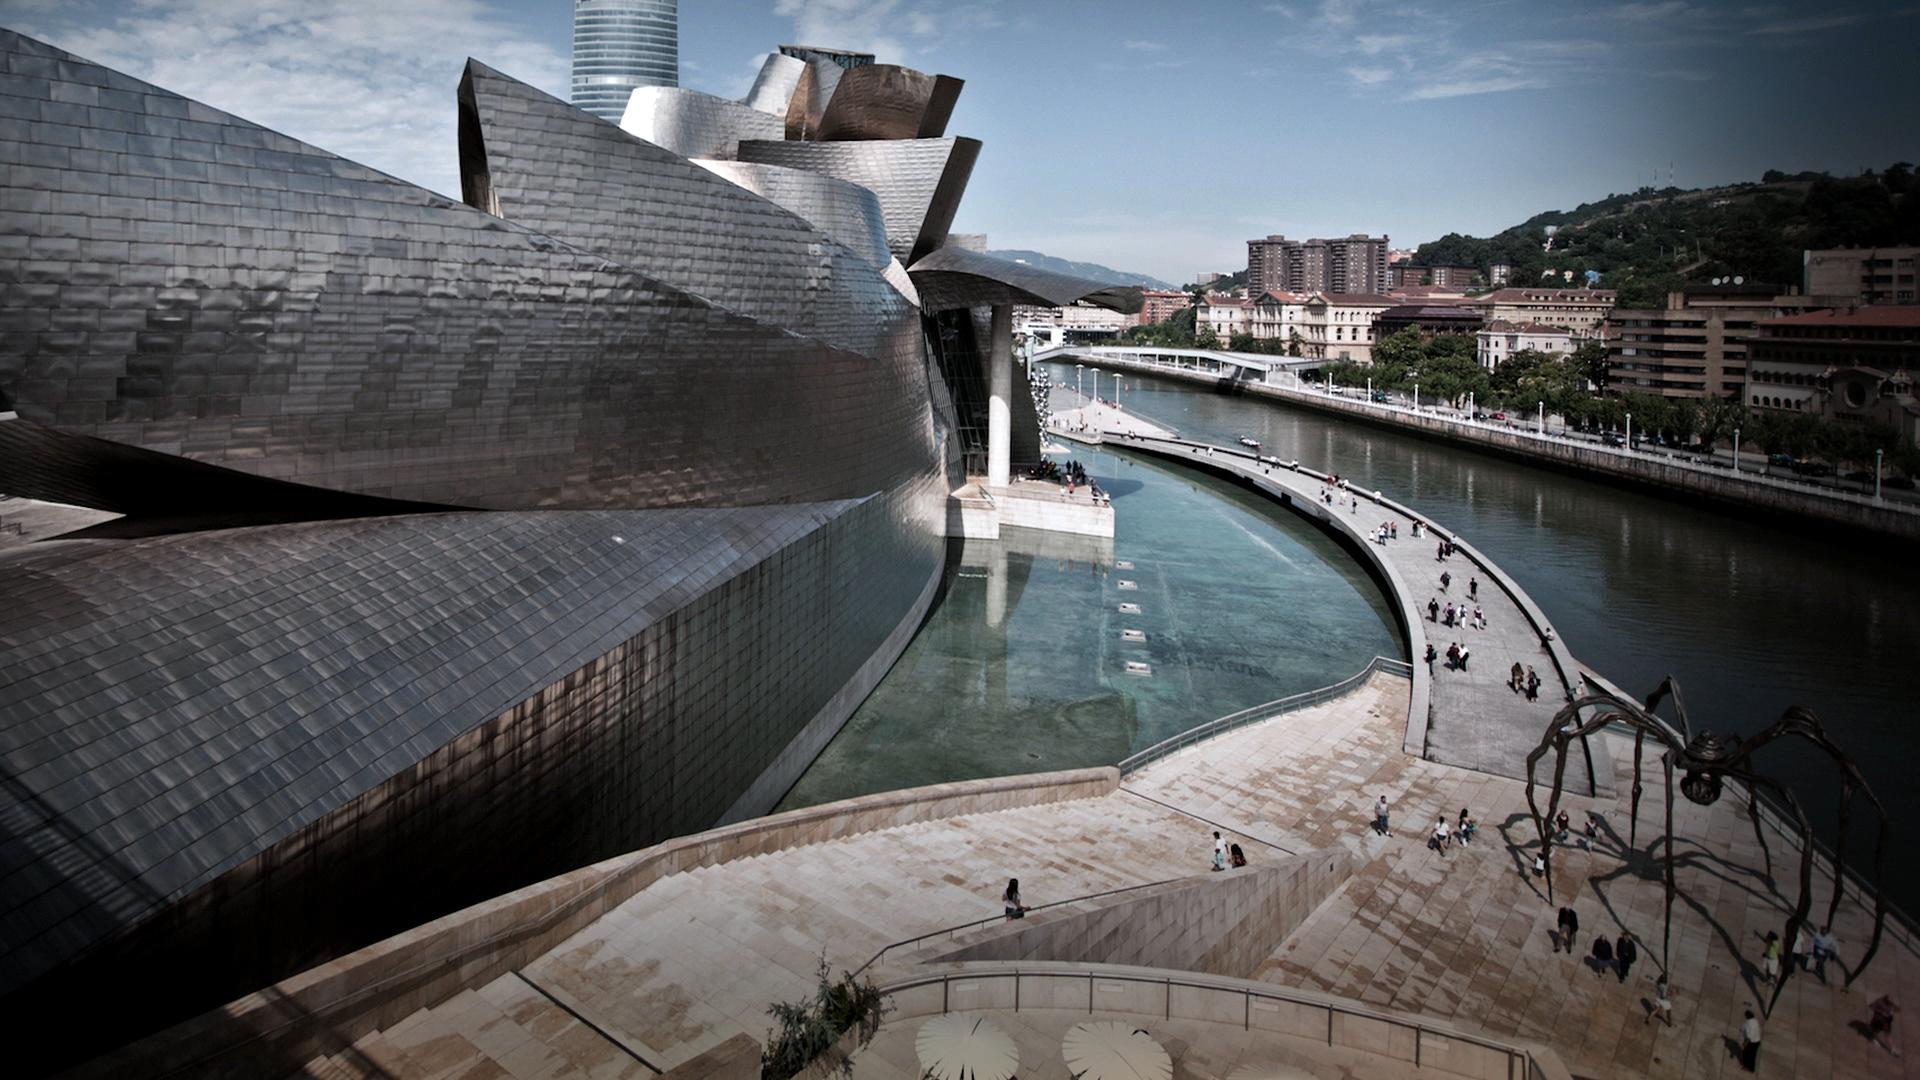 <i>CULTURE</i>Frank Gehry